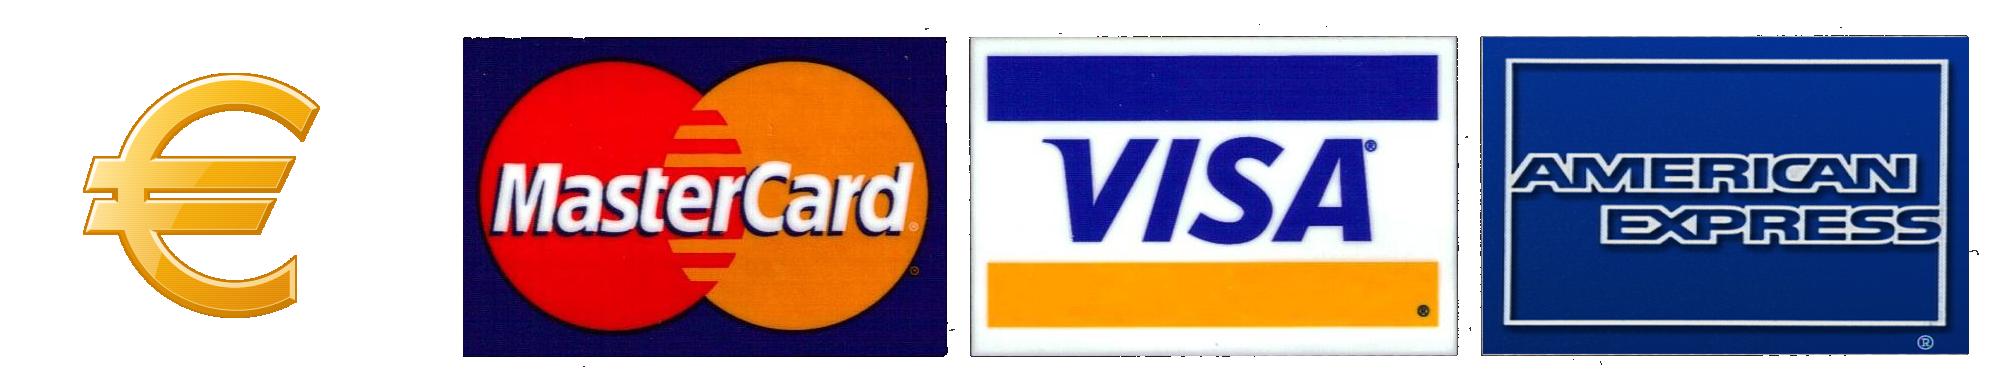 visa-mastercard-american-express-logo.png